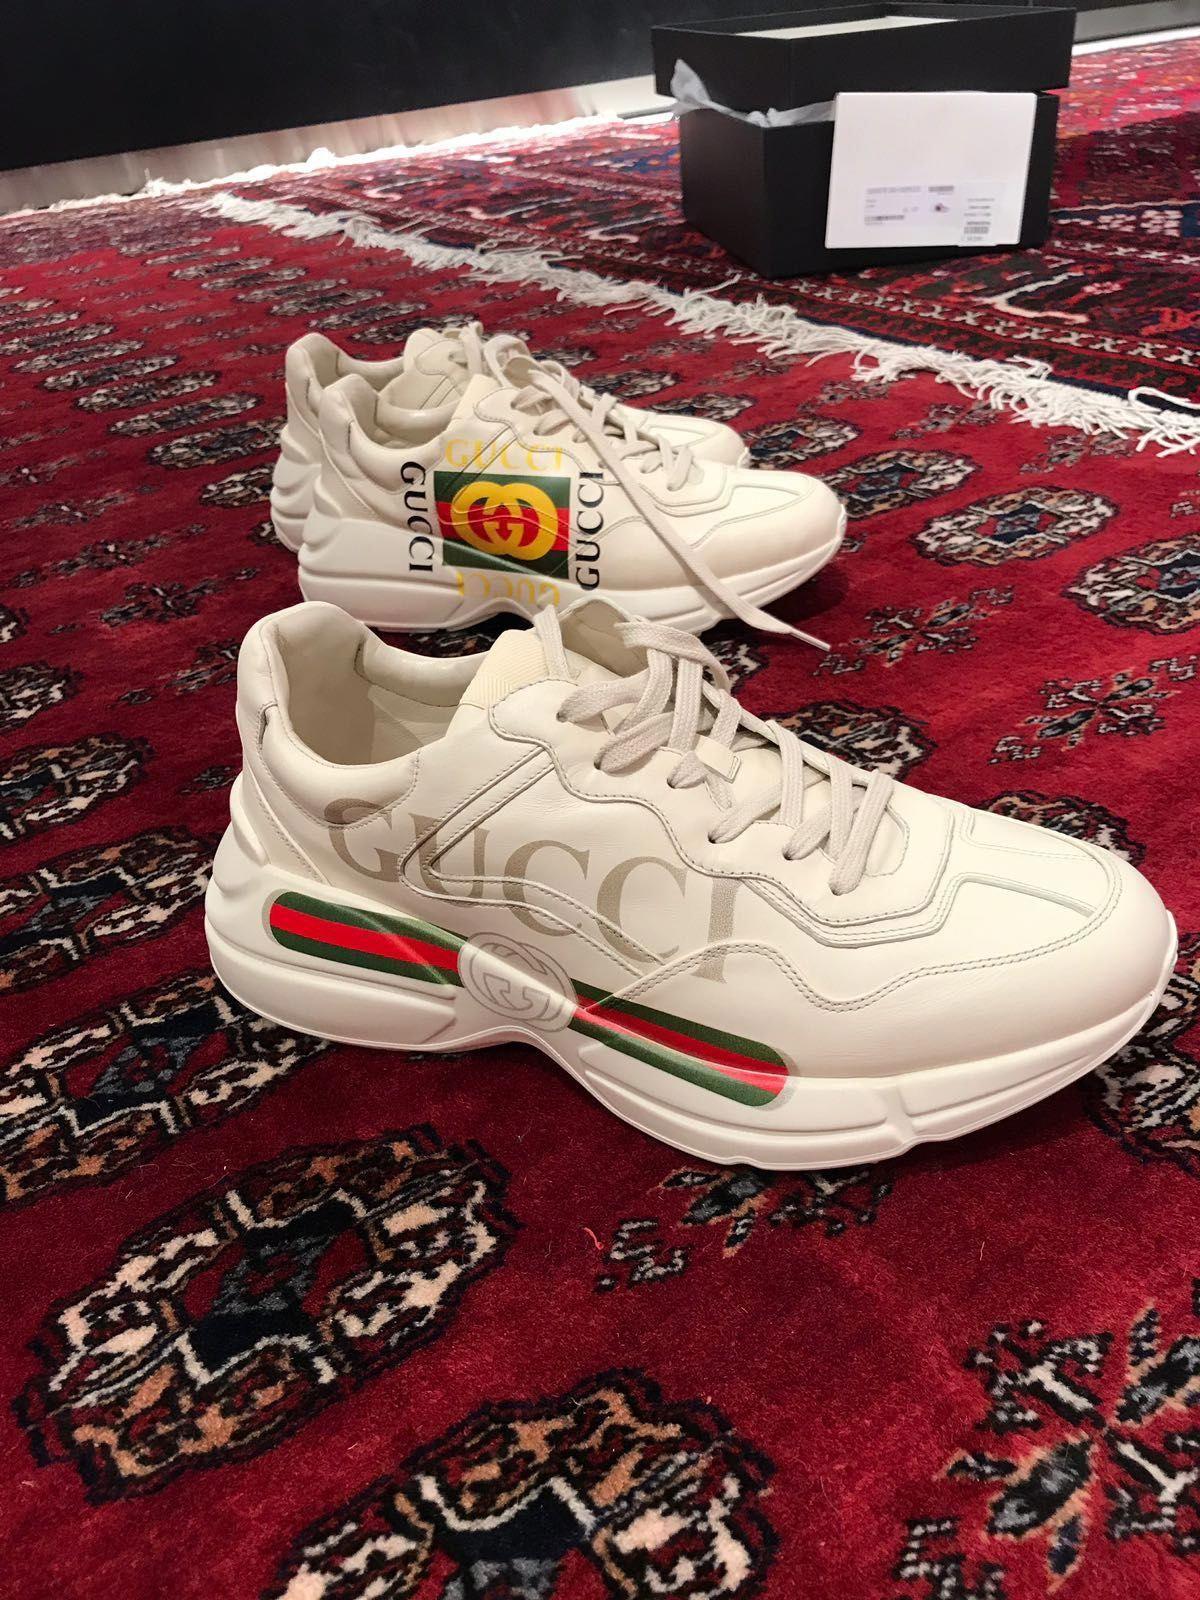 ff6330f6f4 Rhyton Gucci logo leather sneaker € 750 vintage 1980s print ...